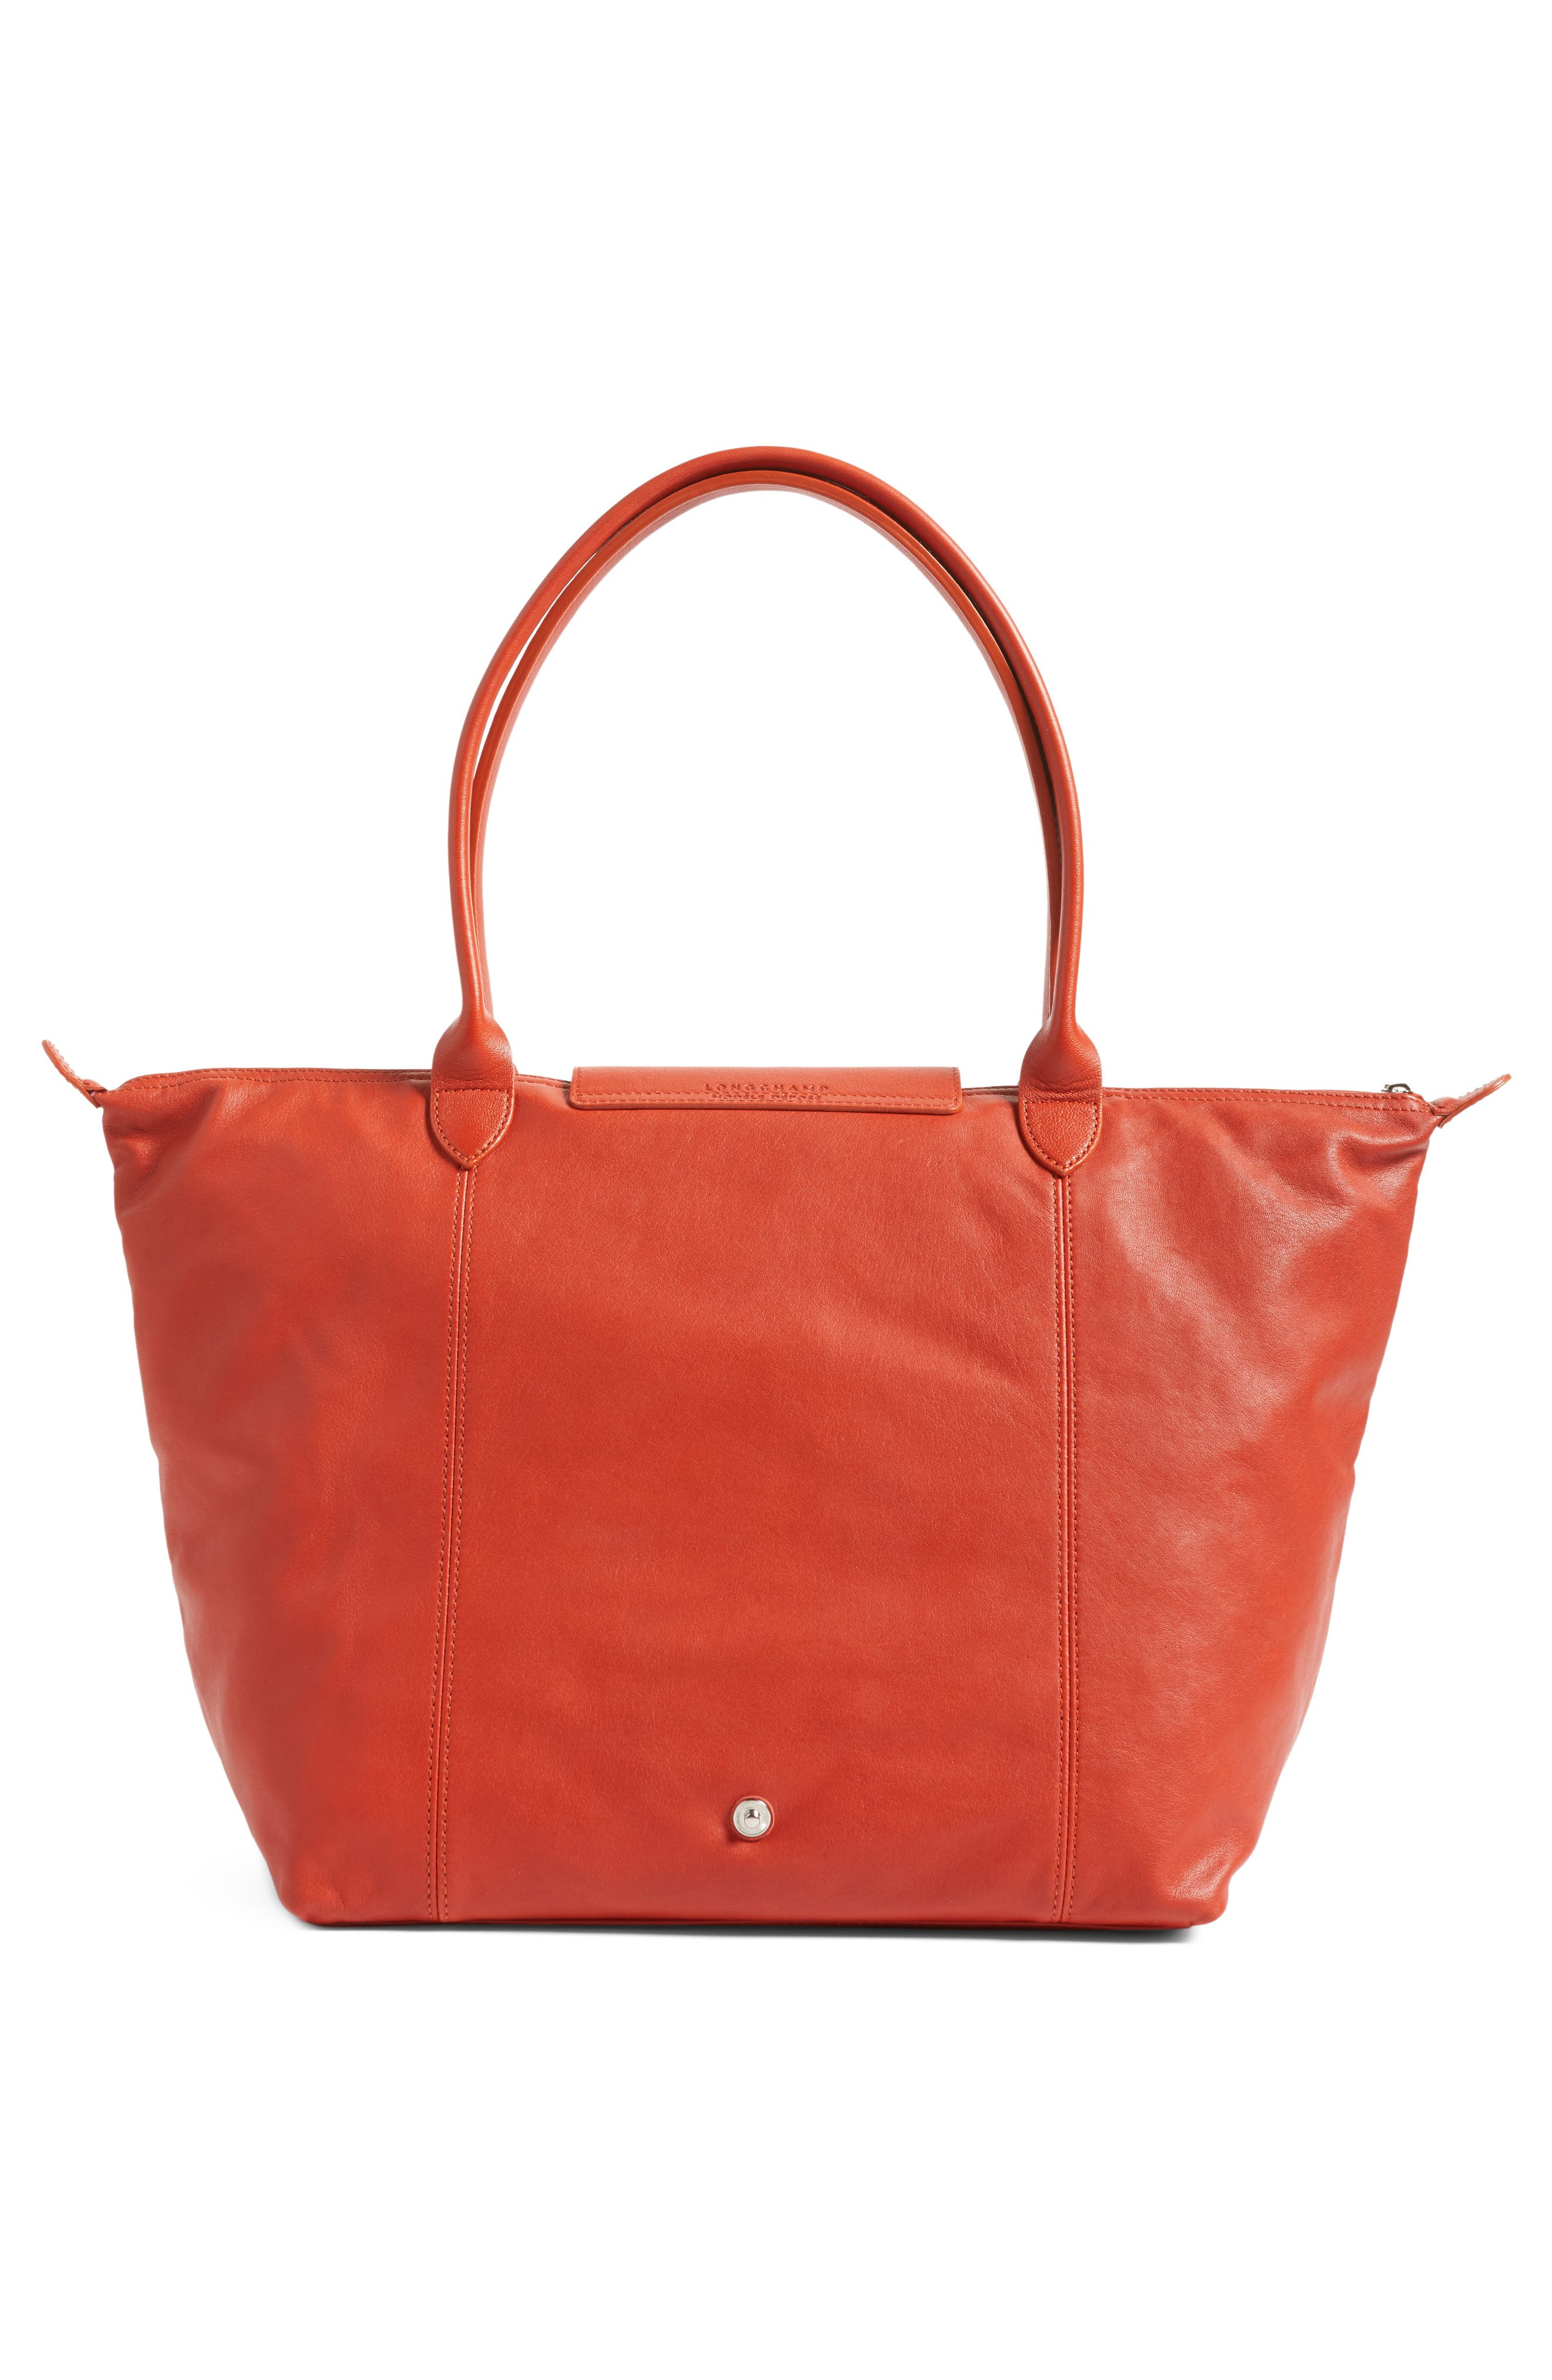 Alternate Image 3  - Longchamp 'Le Pliage Cuir' Leather Tote